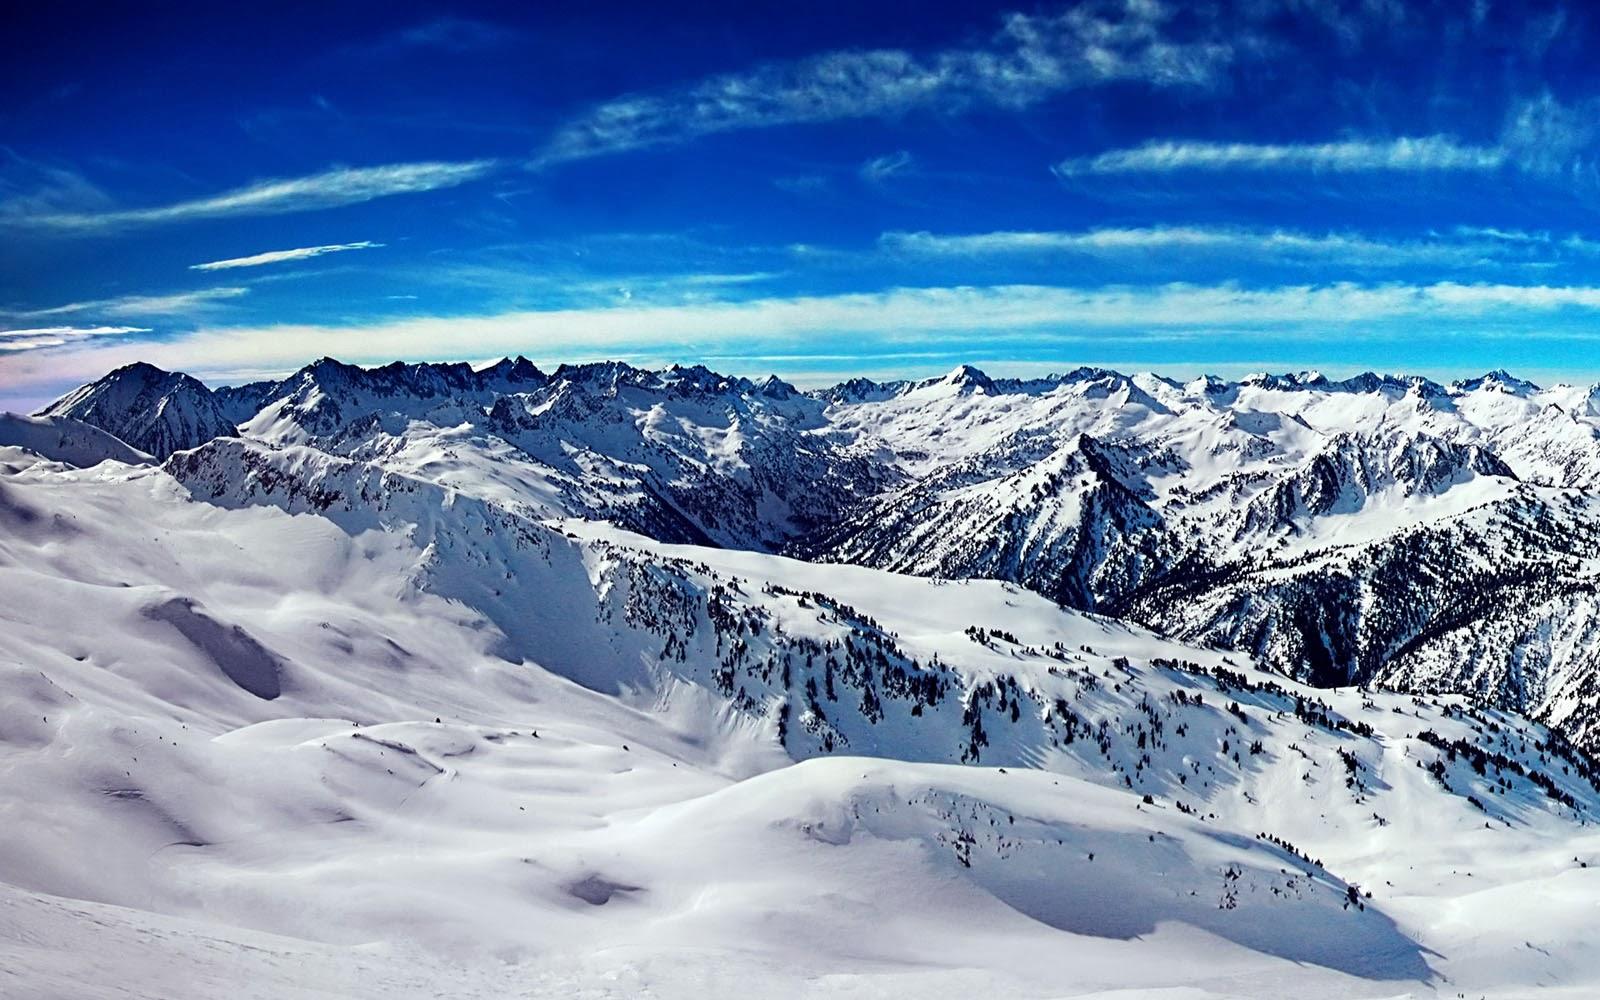 Download Desktop 3d Wallpapers Wallpapers Icy Mountains Wallpapers